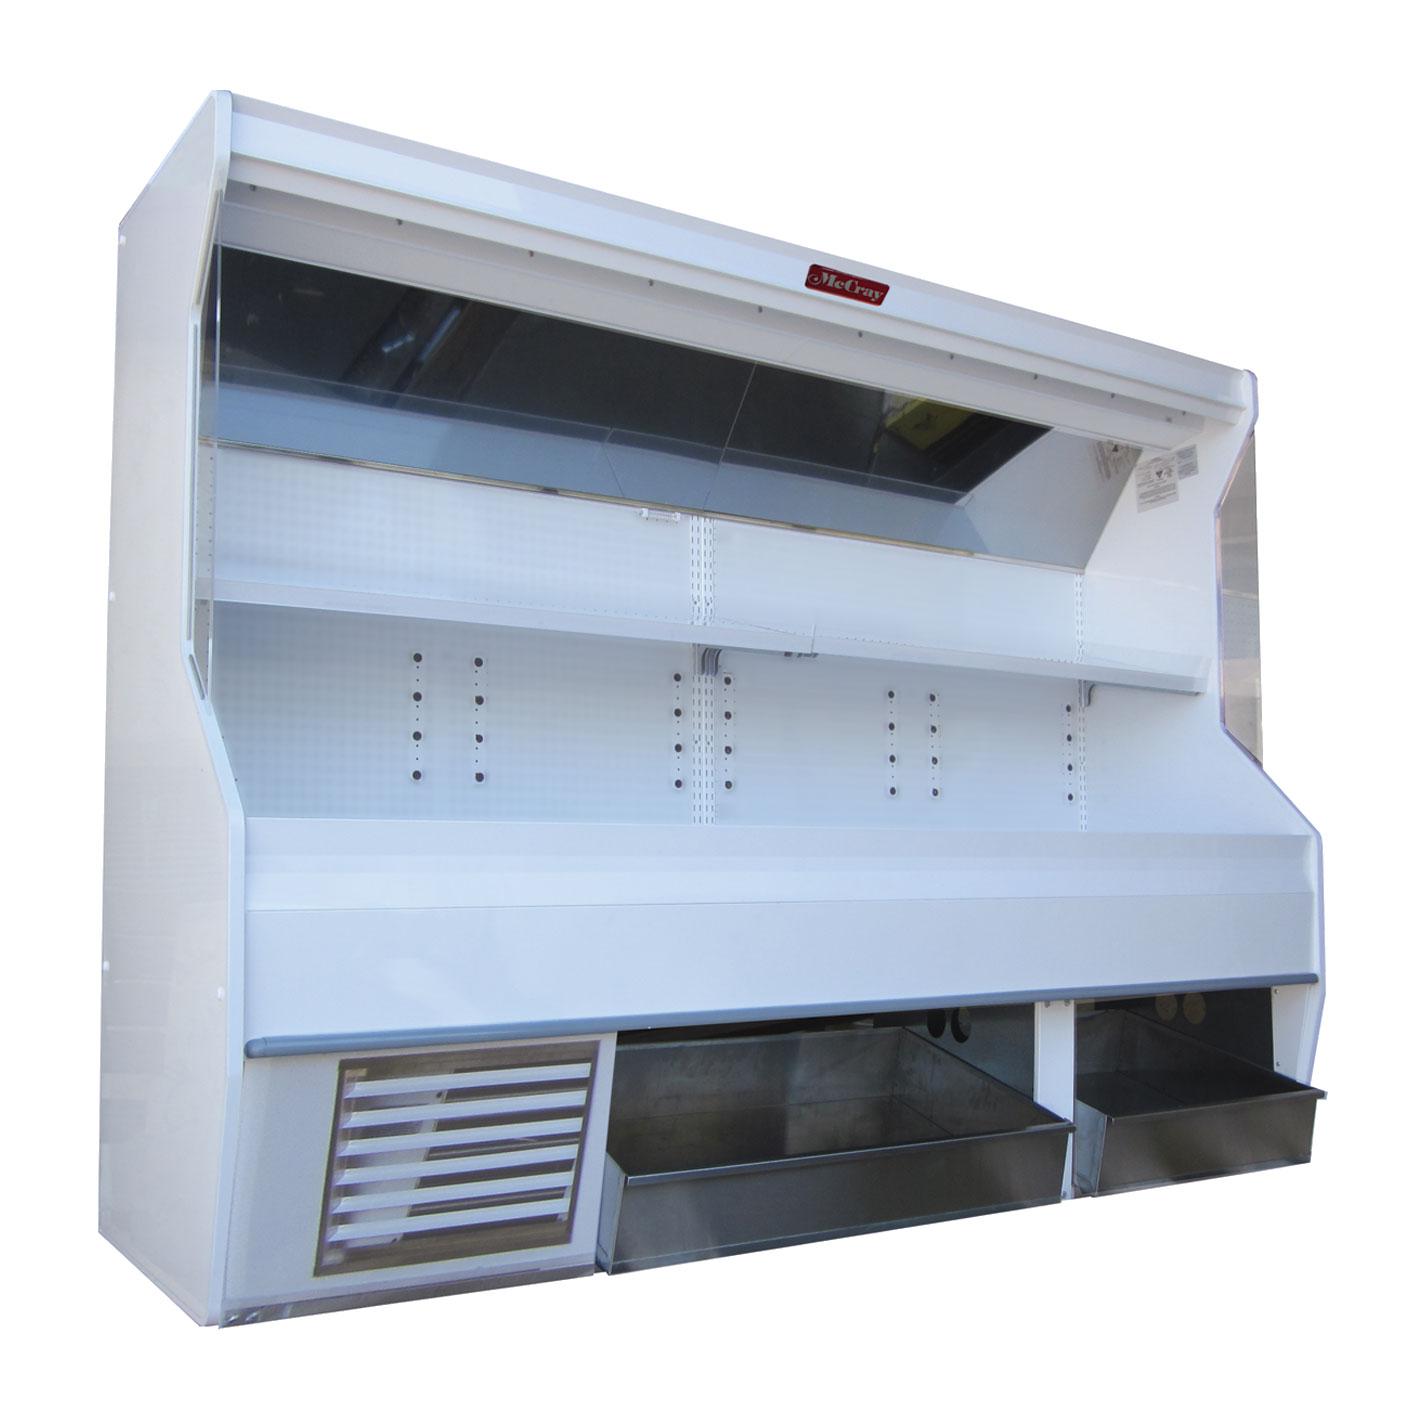 Howard-McCray R-P32E-4S-BINS-LED display case, produce